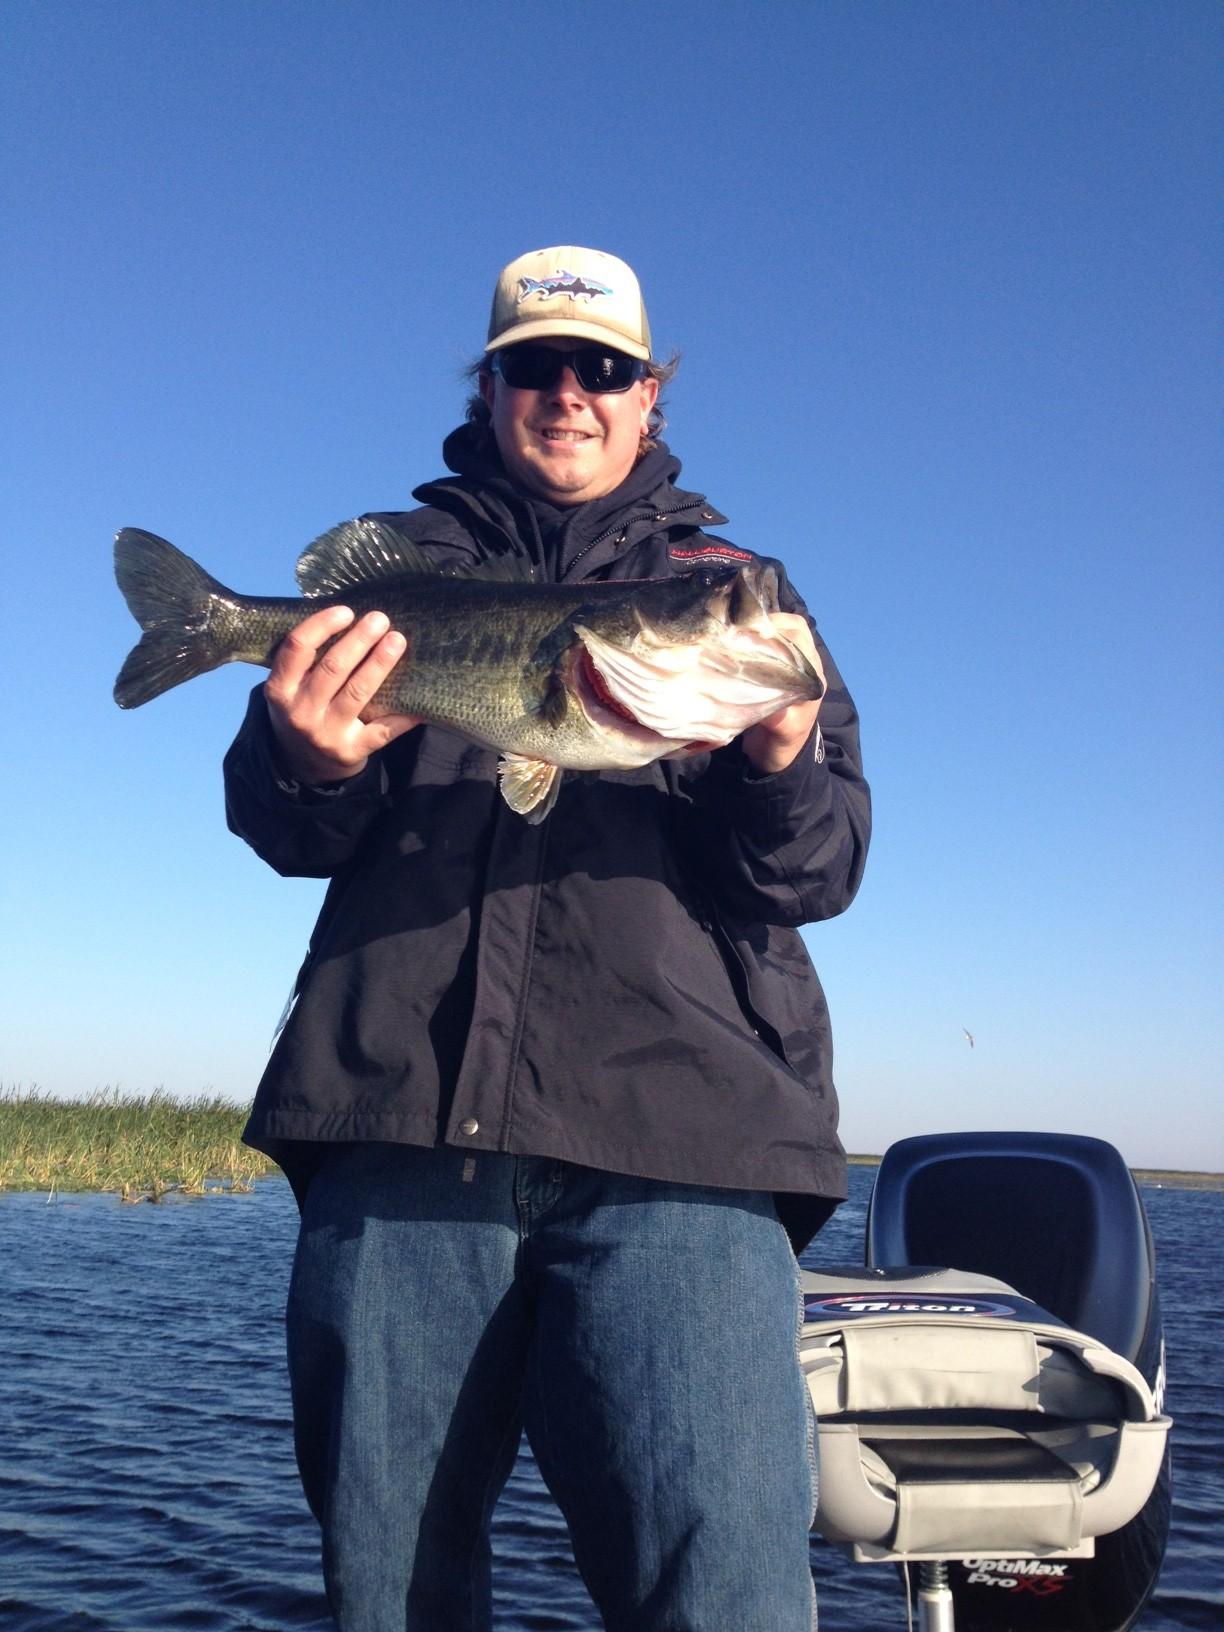 Fly fishing on lake o central florida bass guides for Florida bass fishing guides